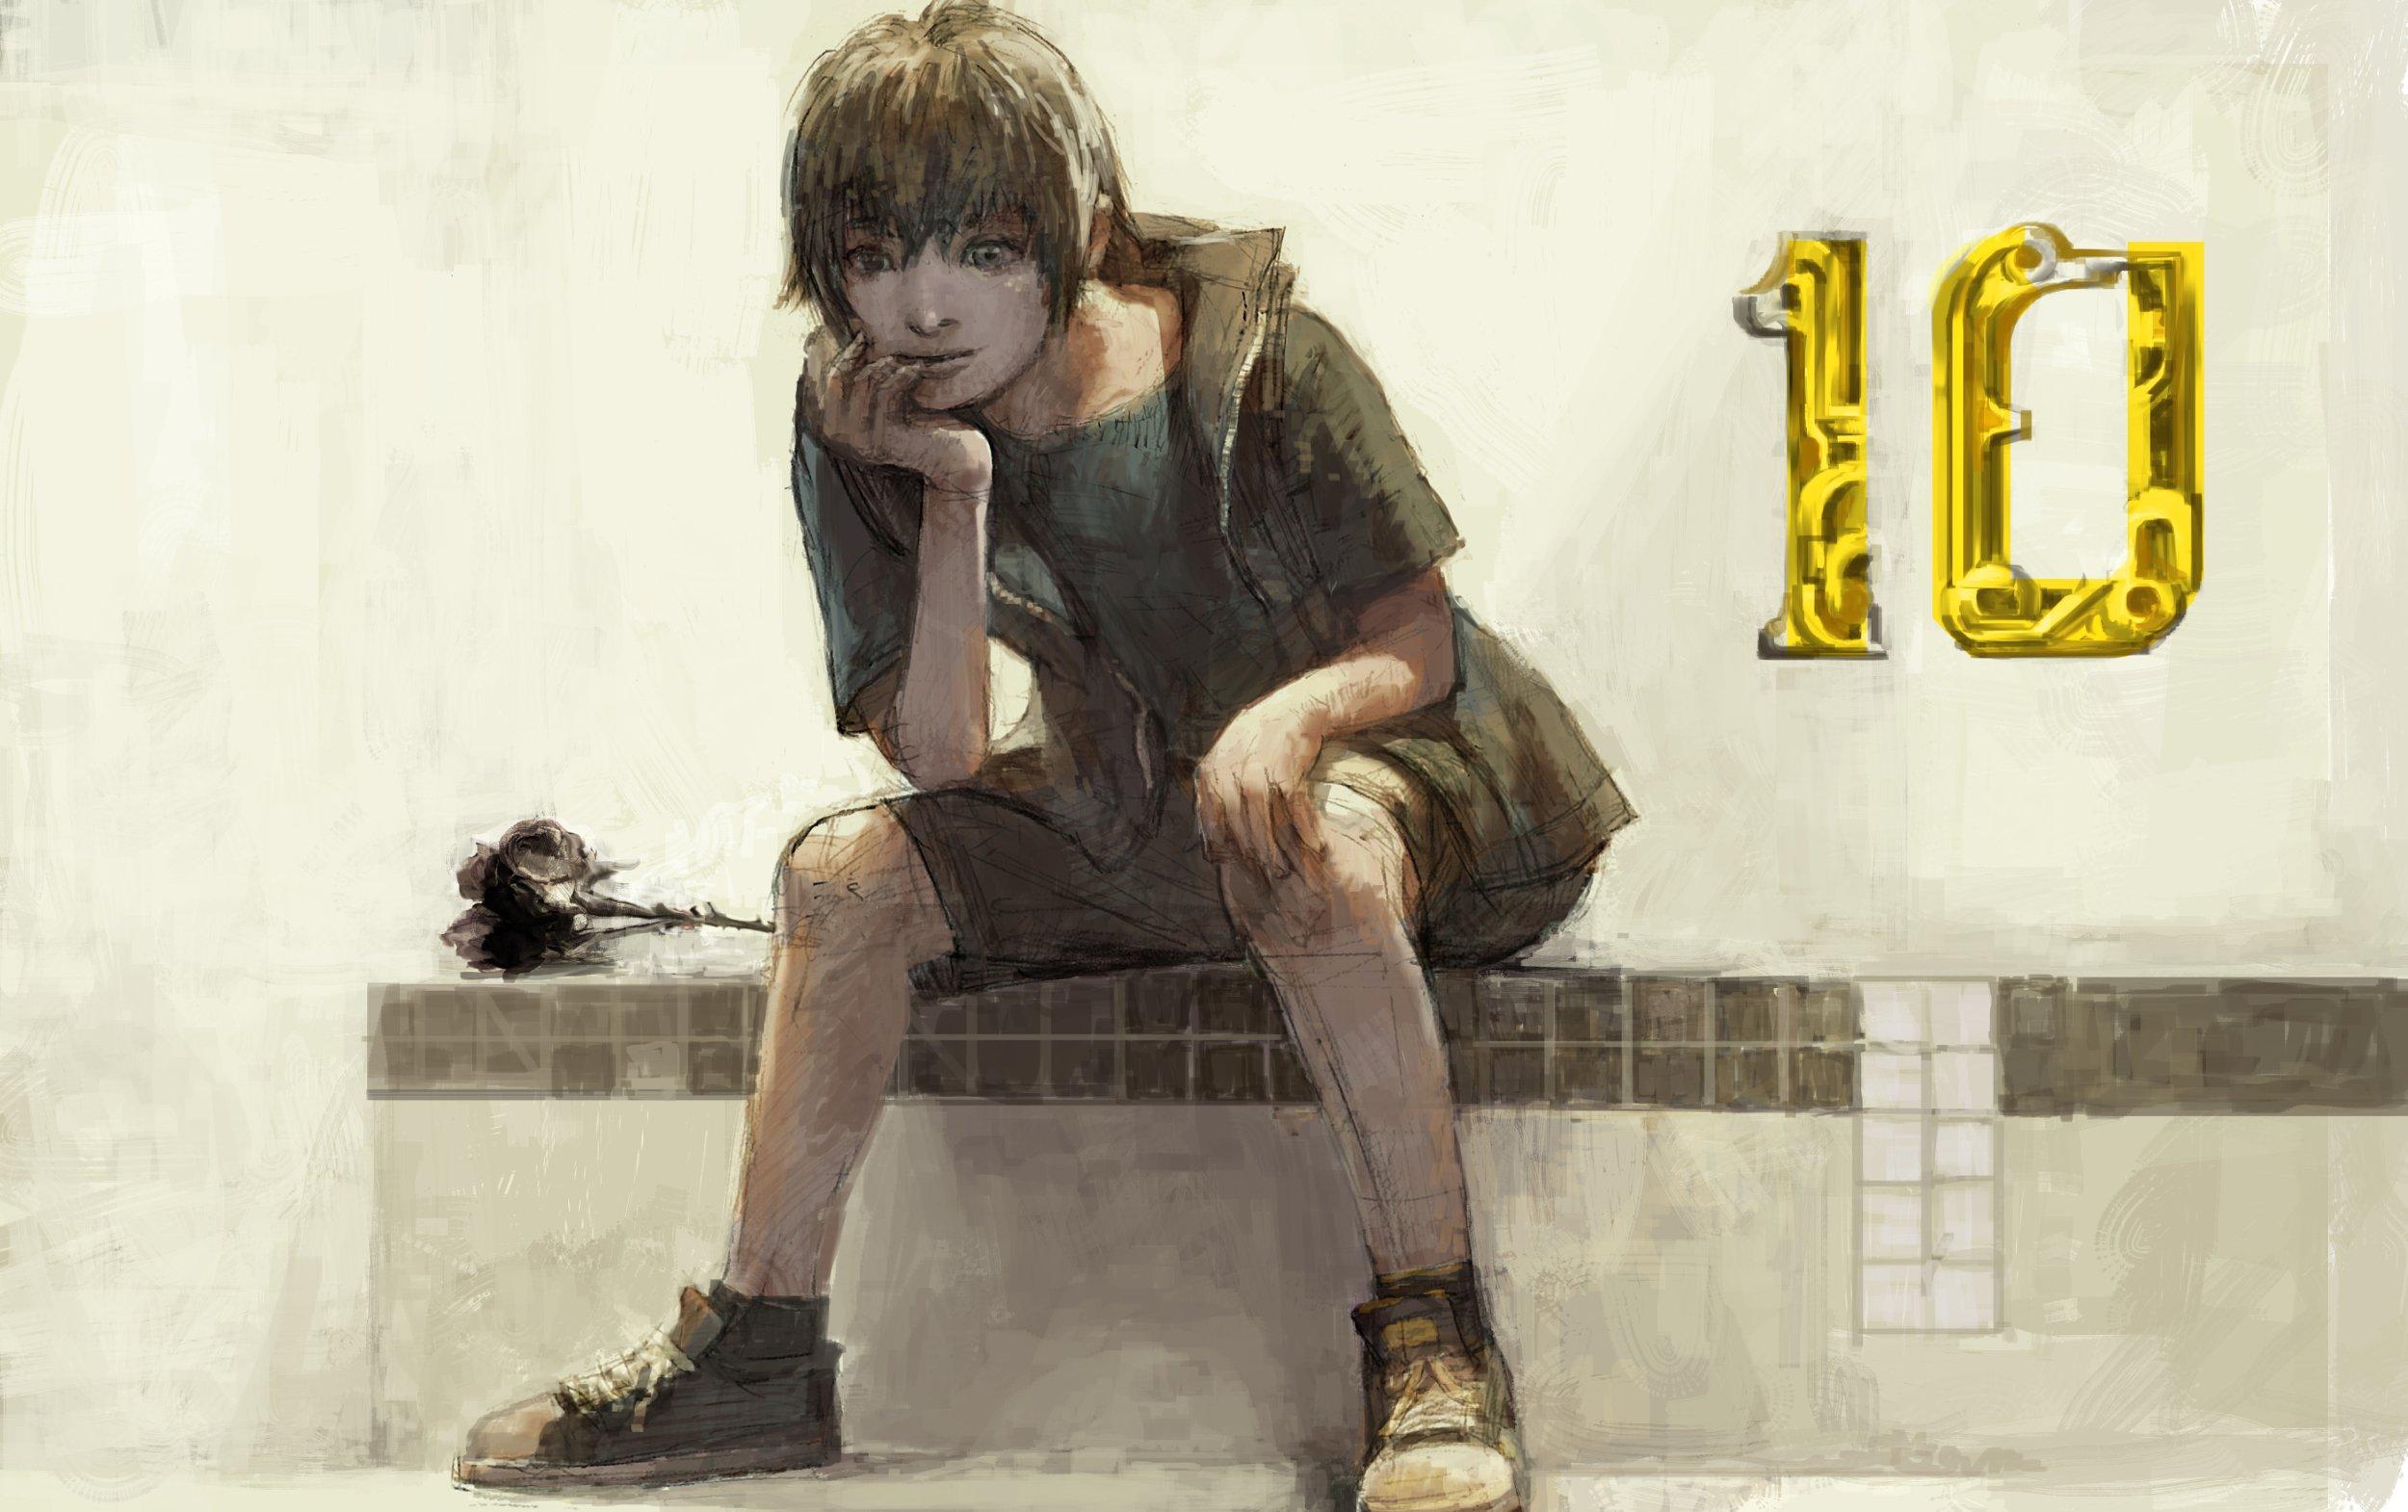 final-fantasy-xv-artwork-countdown